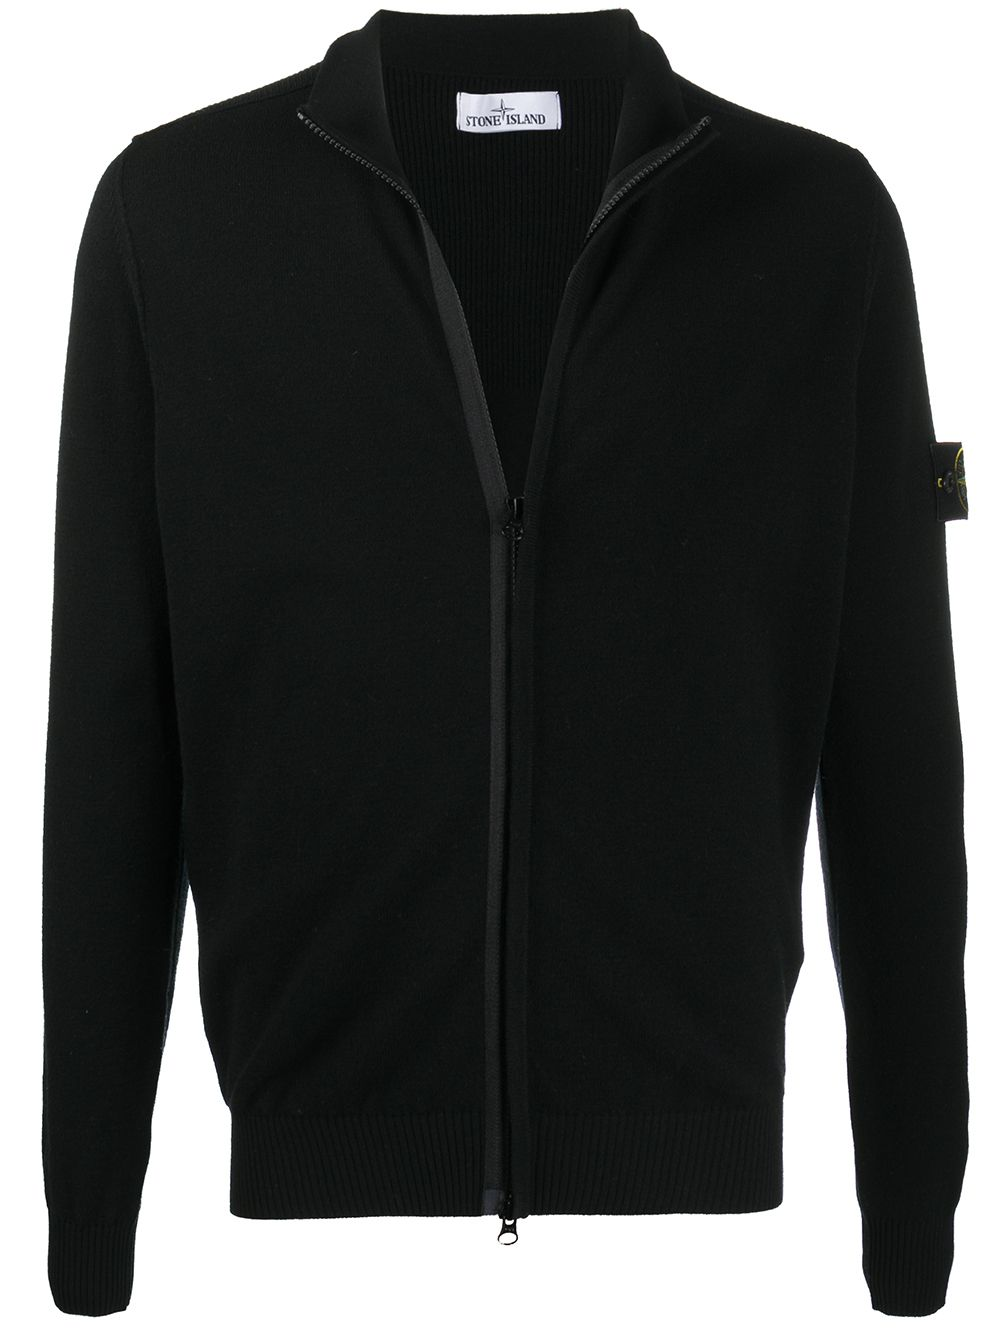 Black wool blend zipped cardigan  STONE ISLAND |  | 7315513A1V0029